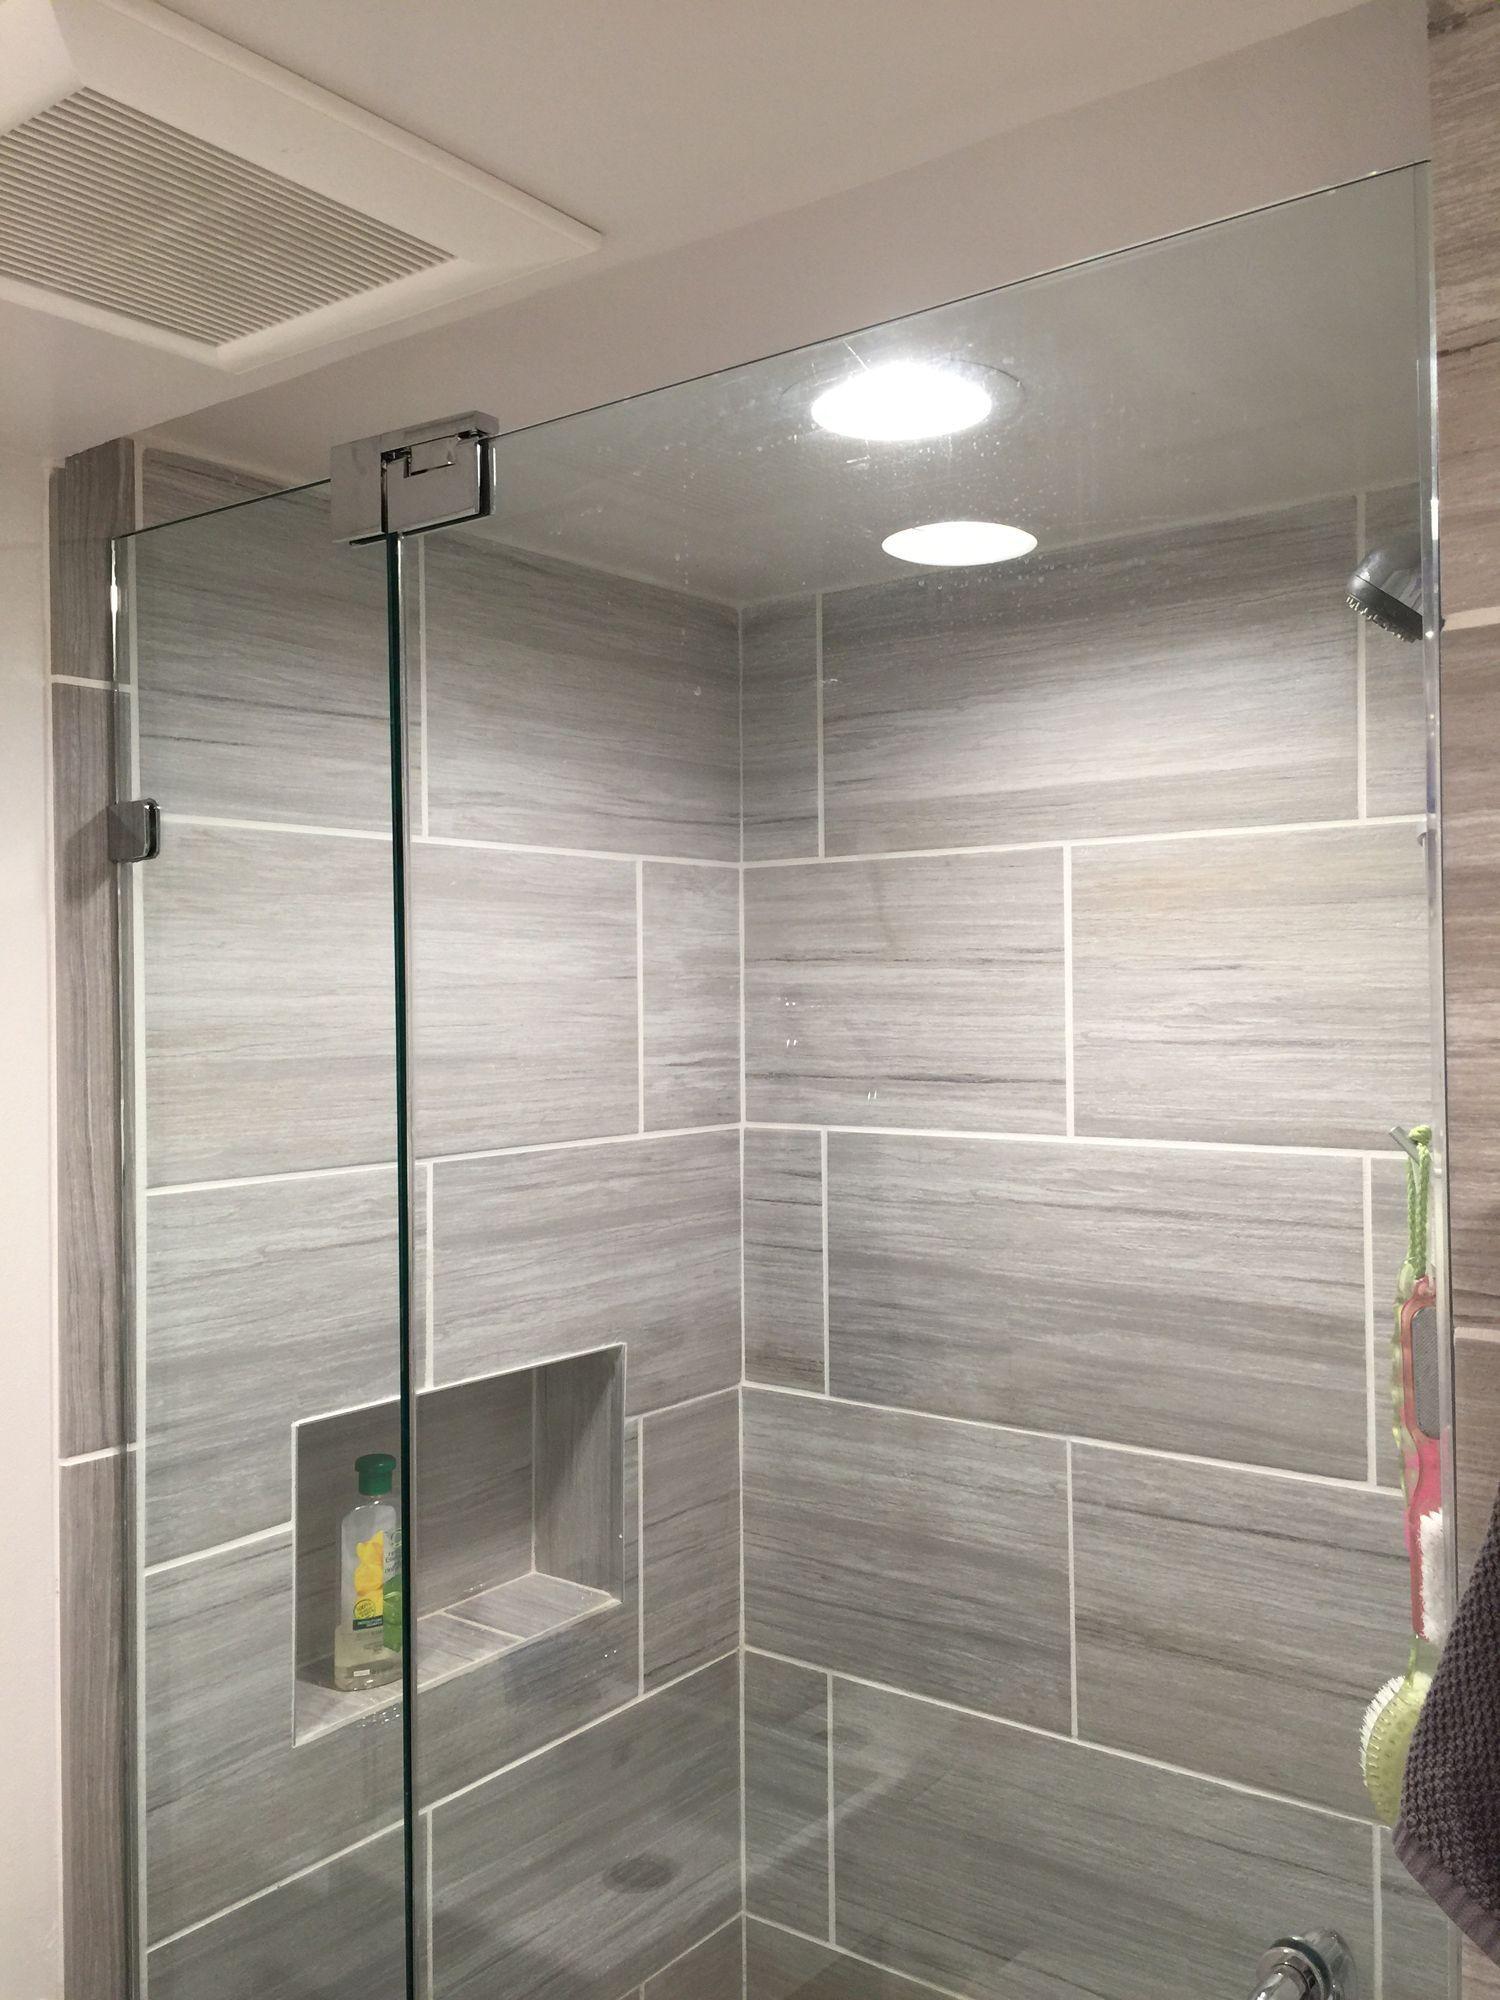 45 Best Creative Shower Doors Design Ideas For Bathroom With Images Frameless Shower Doors Shower Door Installation Bathroom Shower Doors